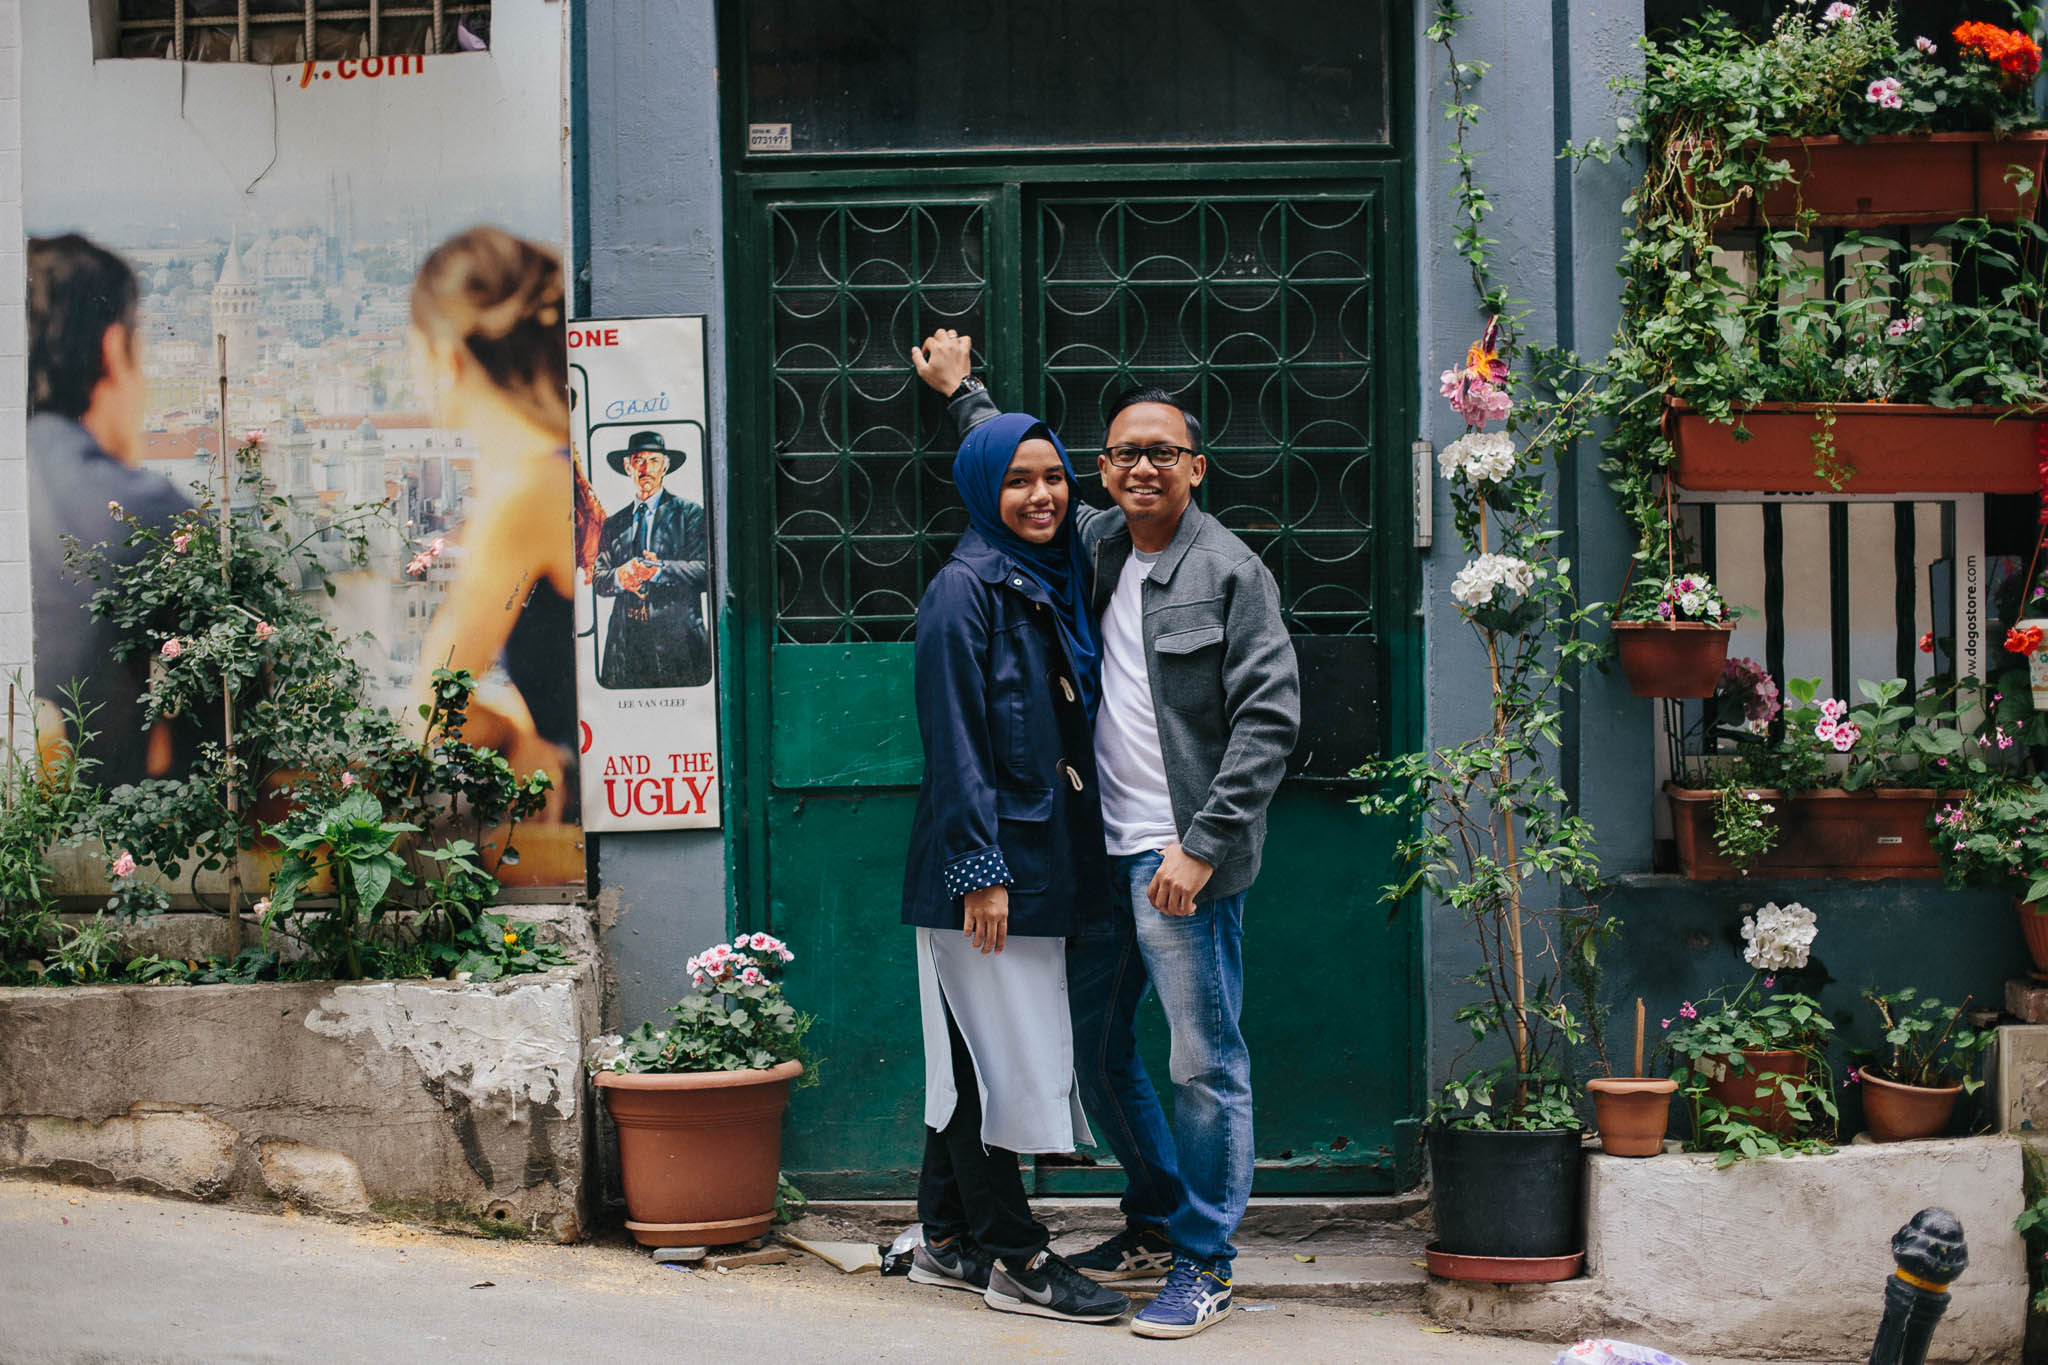 singapore-wedding-photographer-dzul-isma-istanbul-wmt-26.jpg